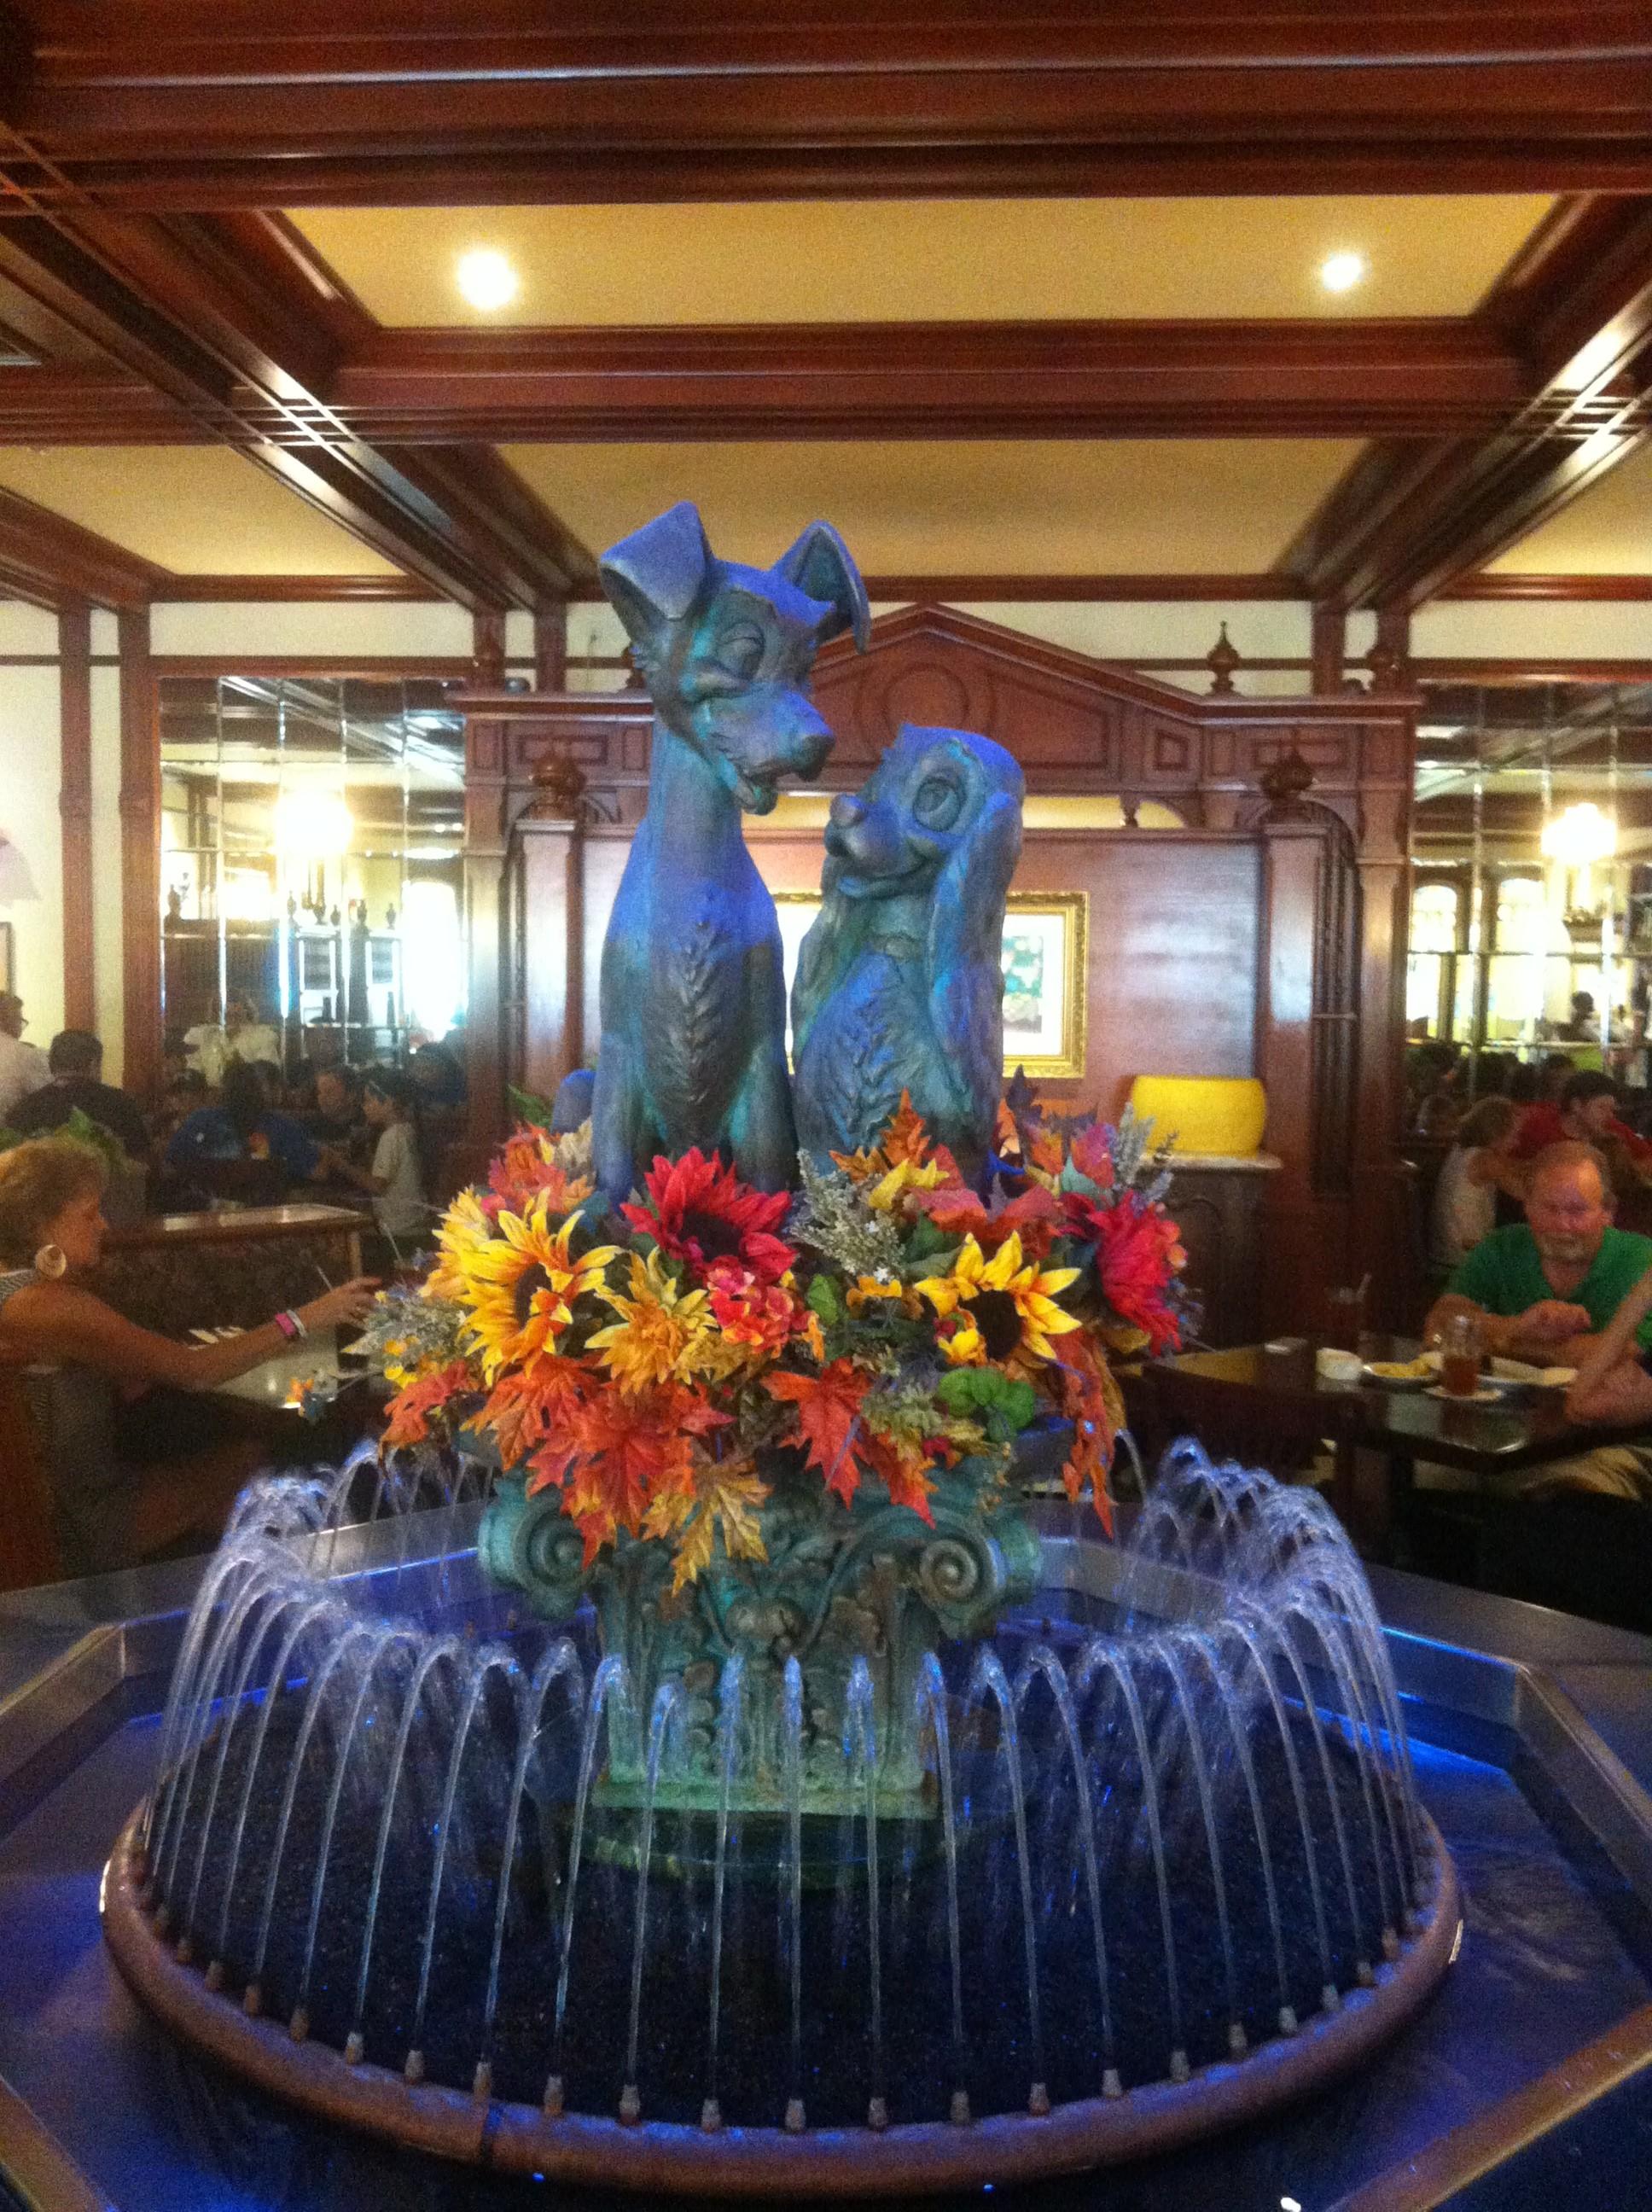 Tony S Town Square Restaurant At Walt Disney World S Magic